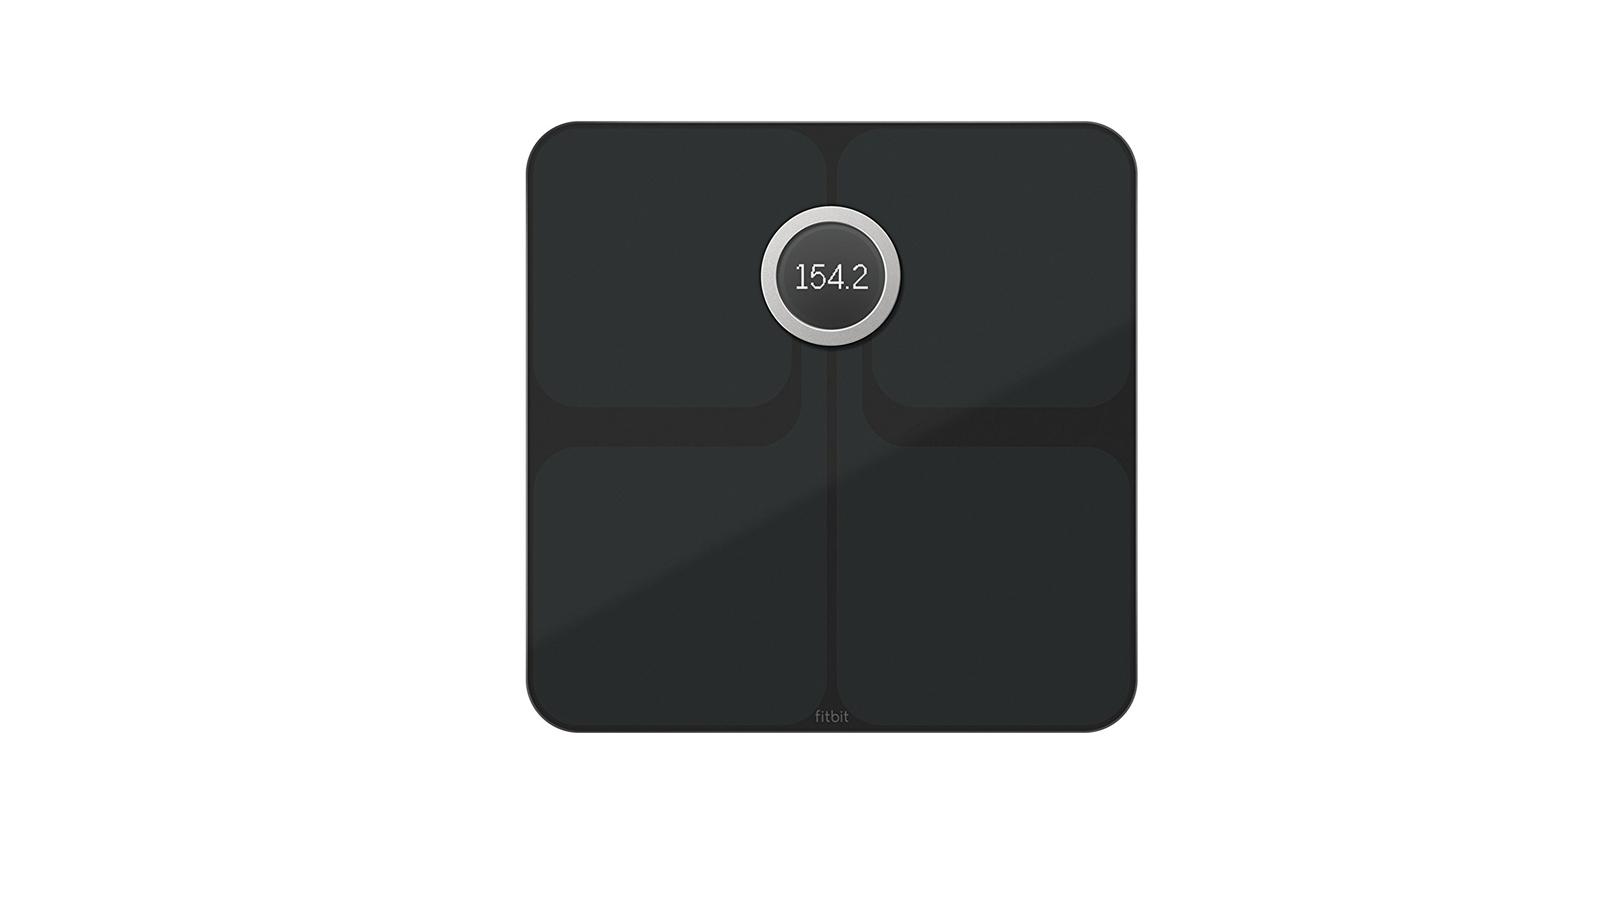 fitbit aria 2 wi fi smart scale black harvey norman malaysia rh harveynorman com my Fitbit Aria vs Withings Scale Fitbit Aria vs Withings Scale